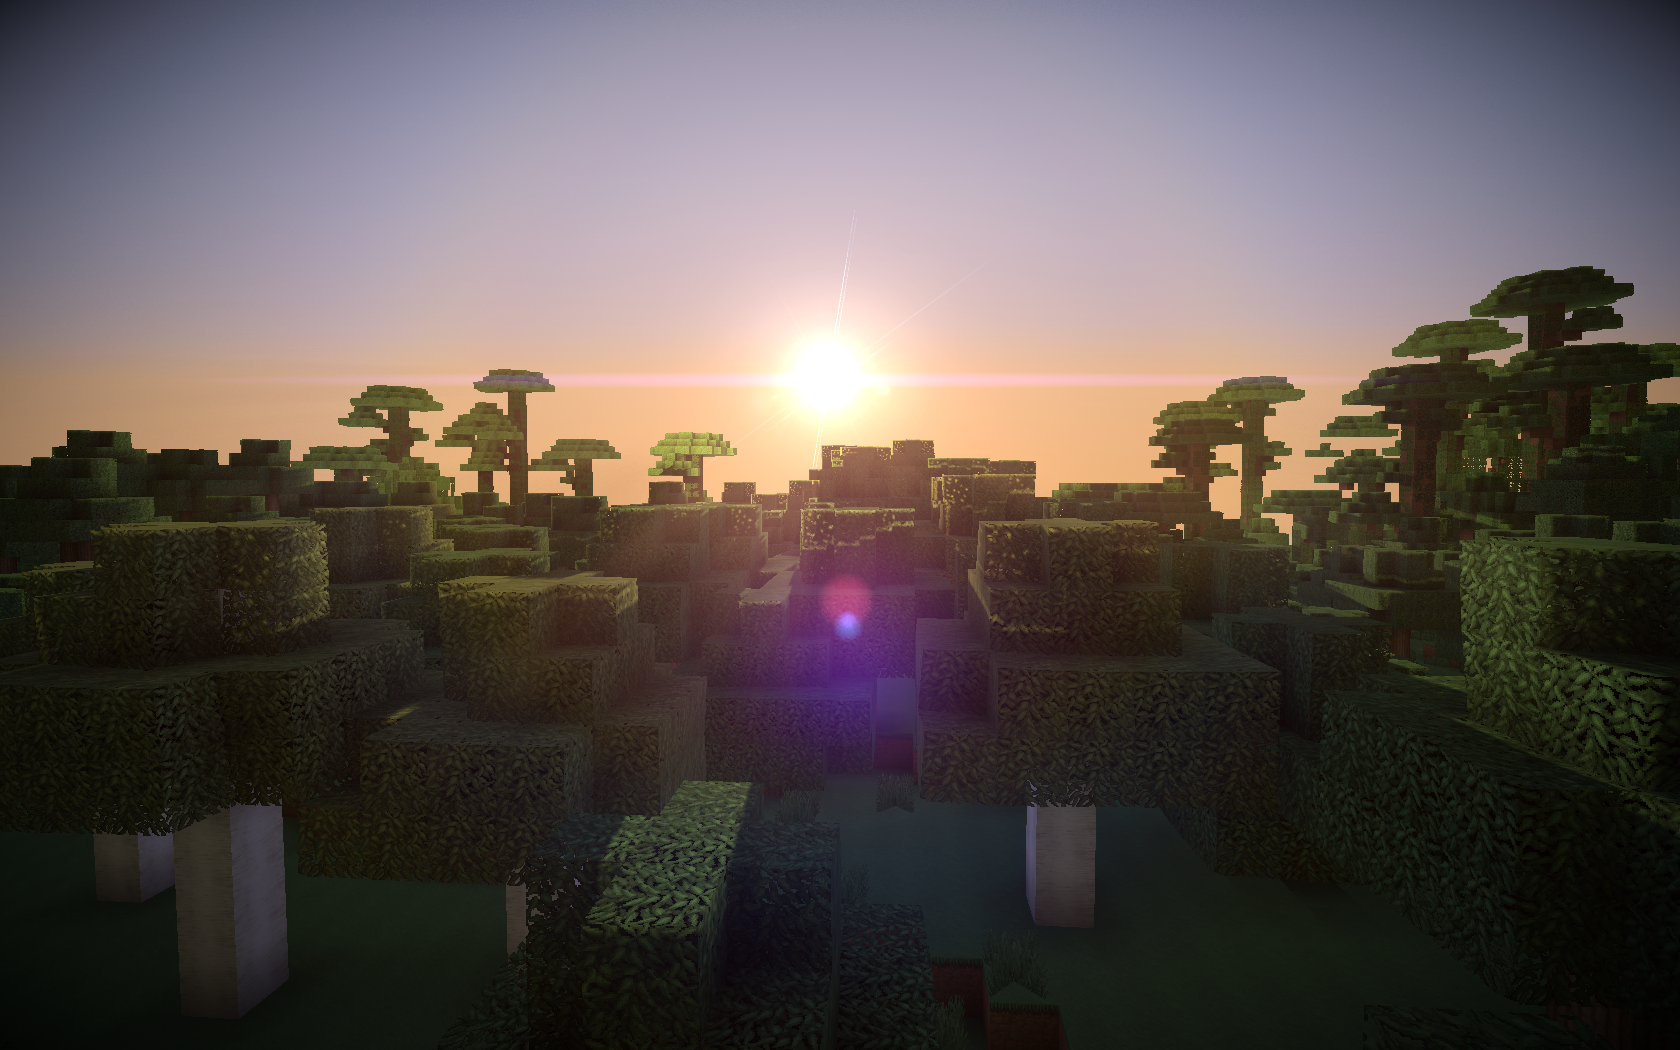 fond-d-écran-minecraft-coucher-soleil